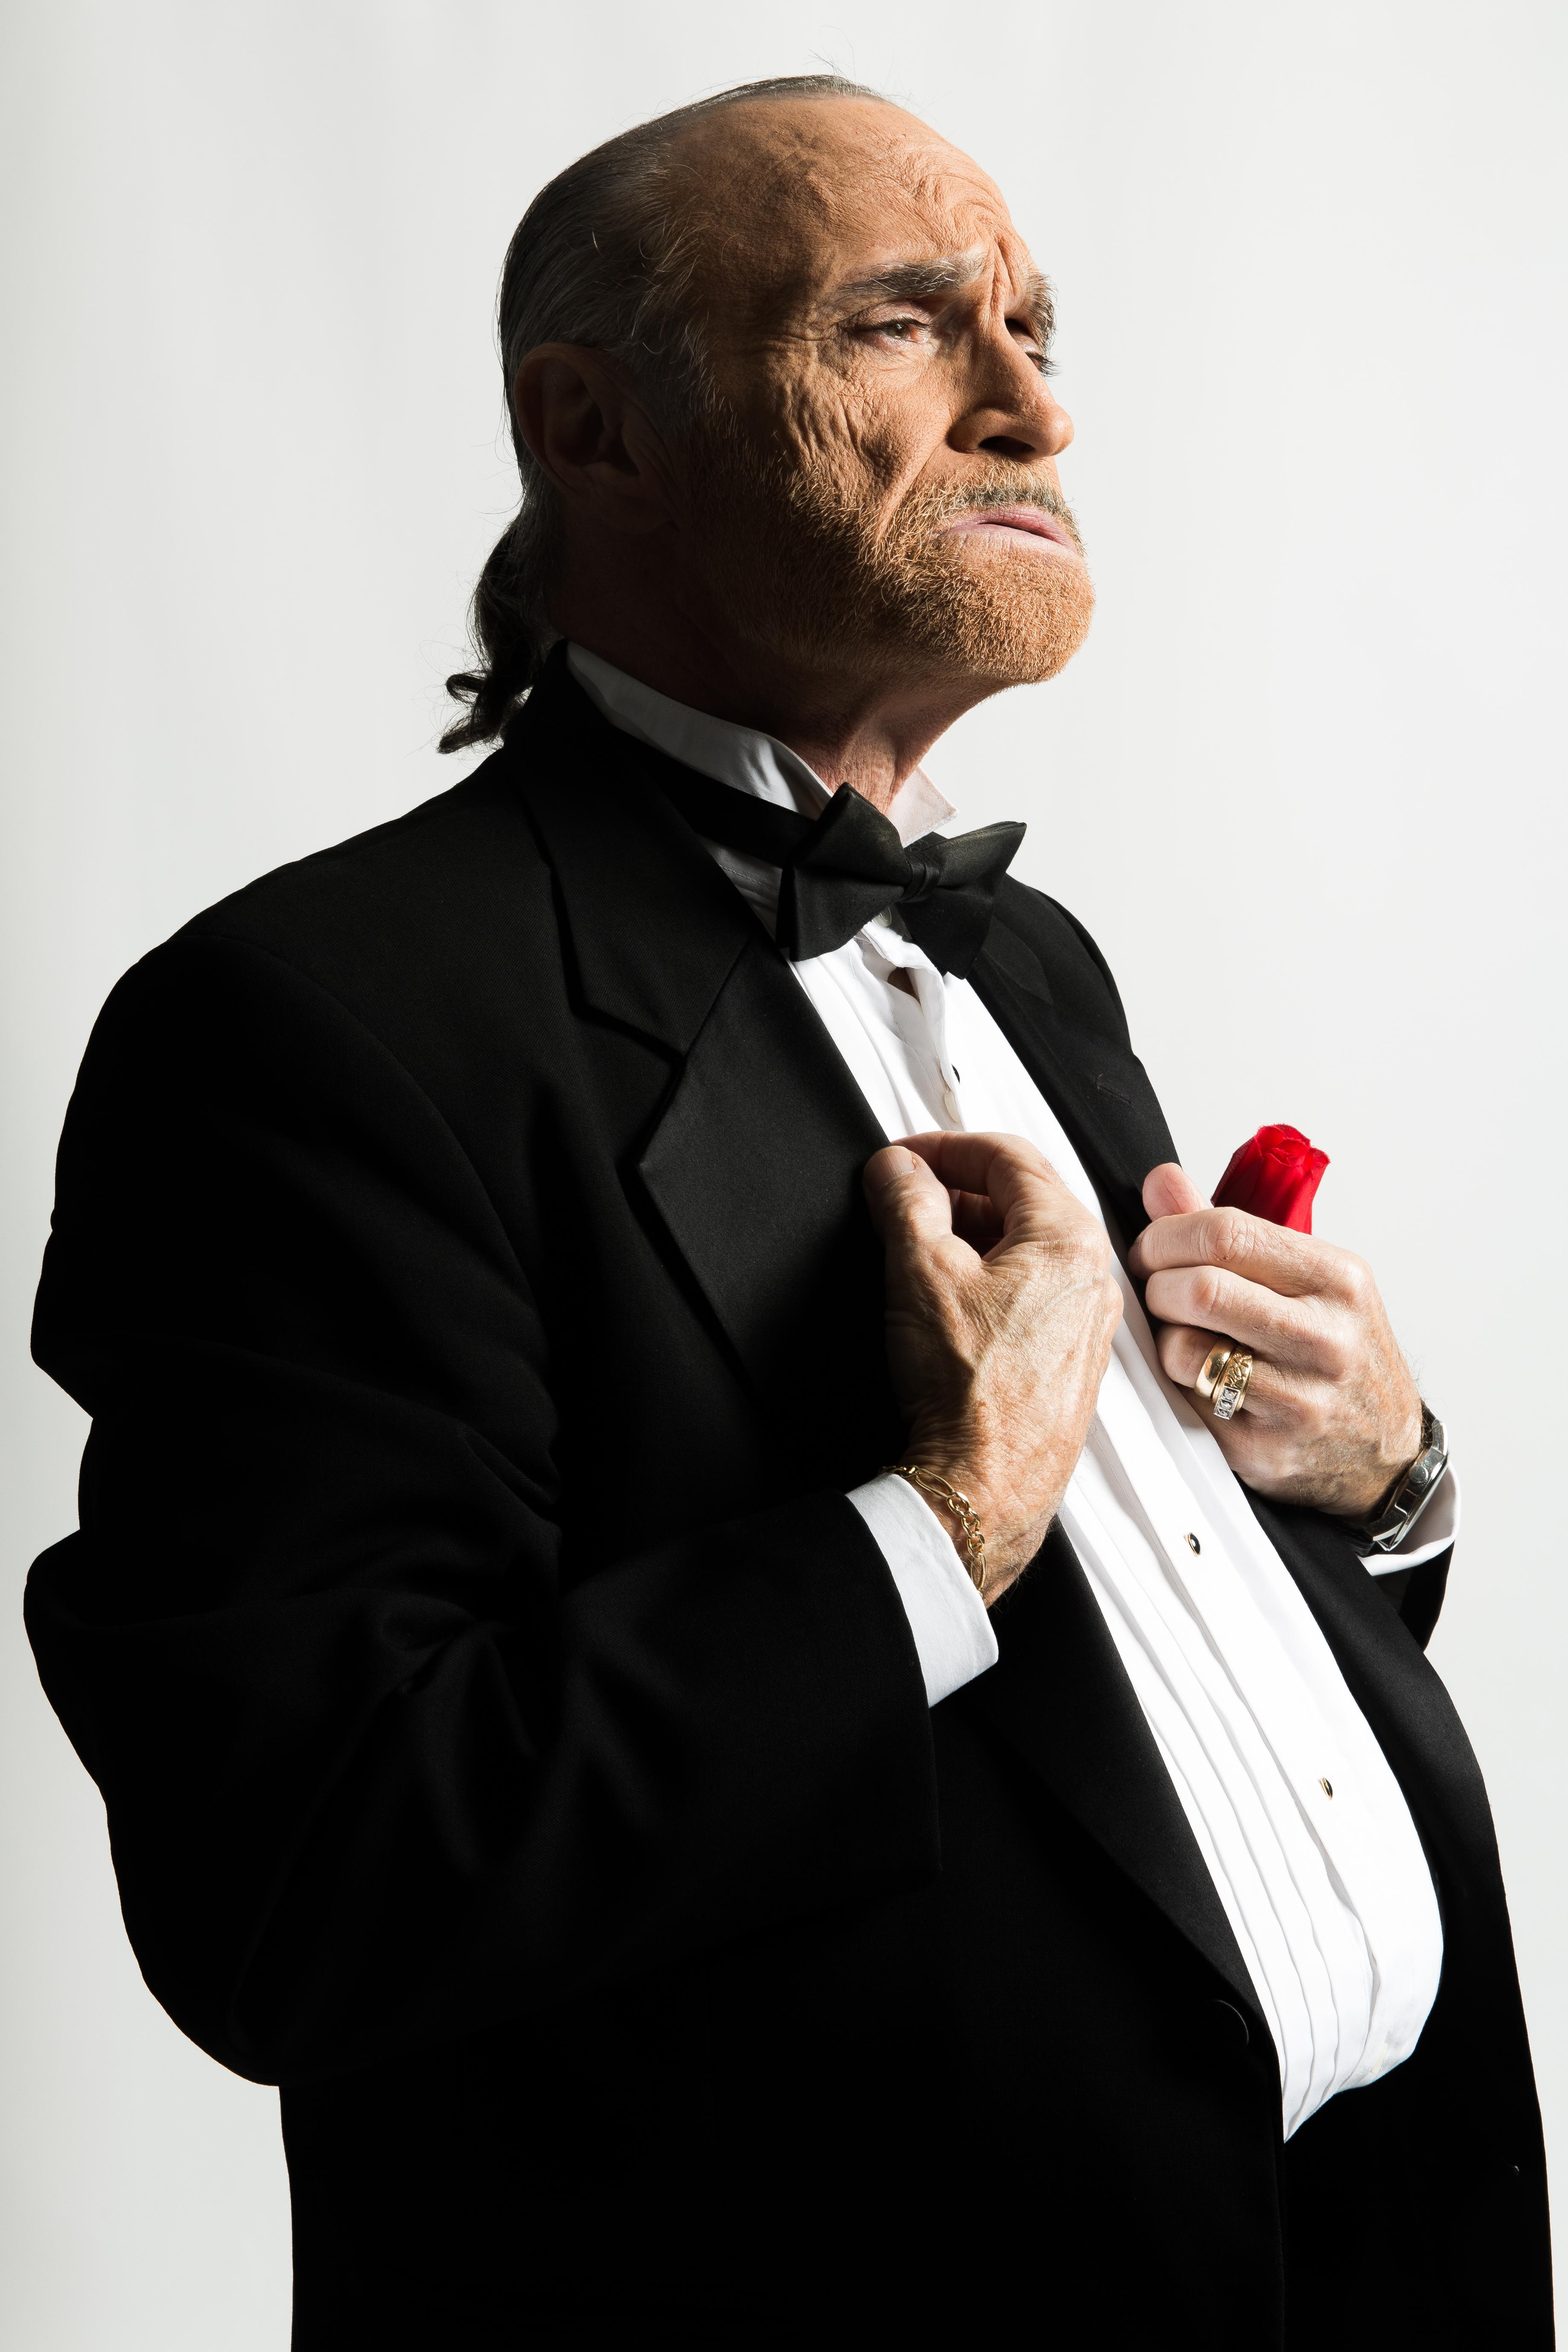 godfather comedy with joe beddia Image